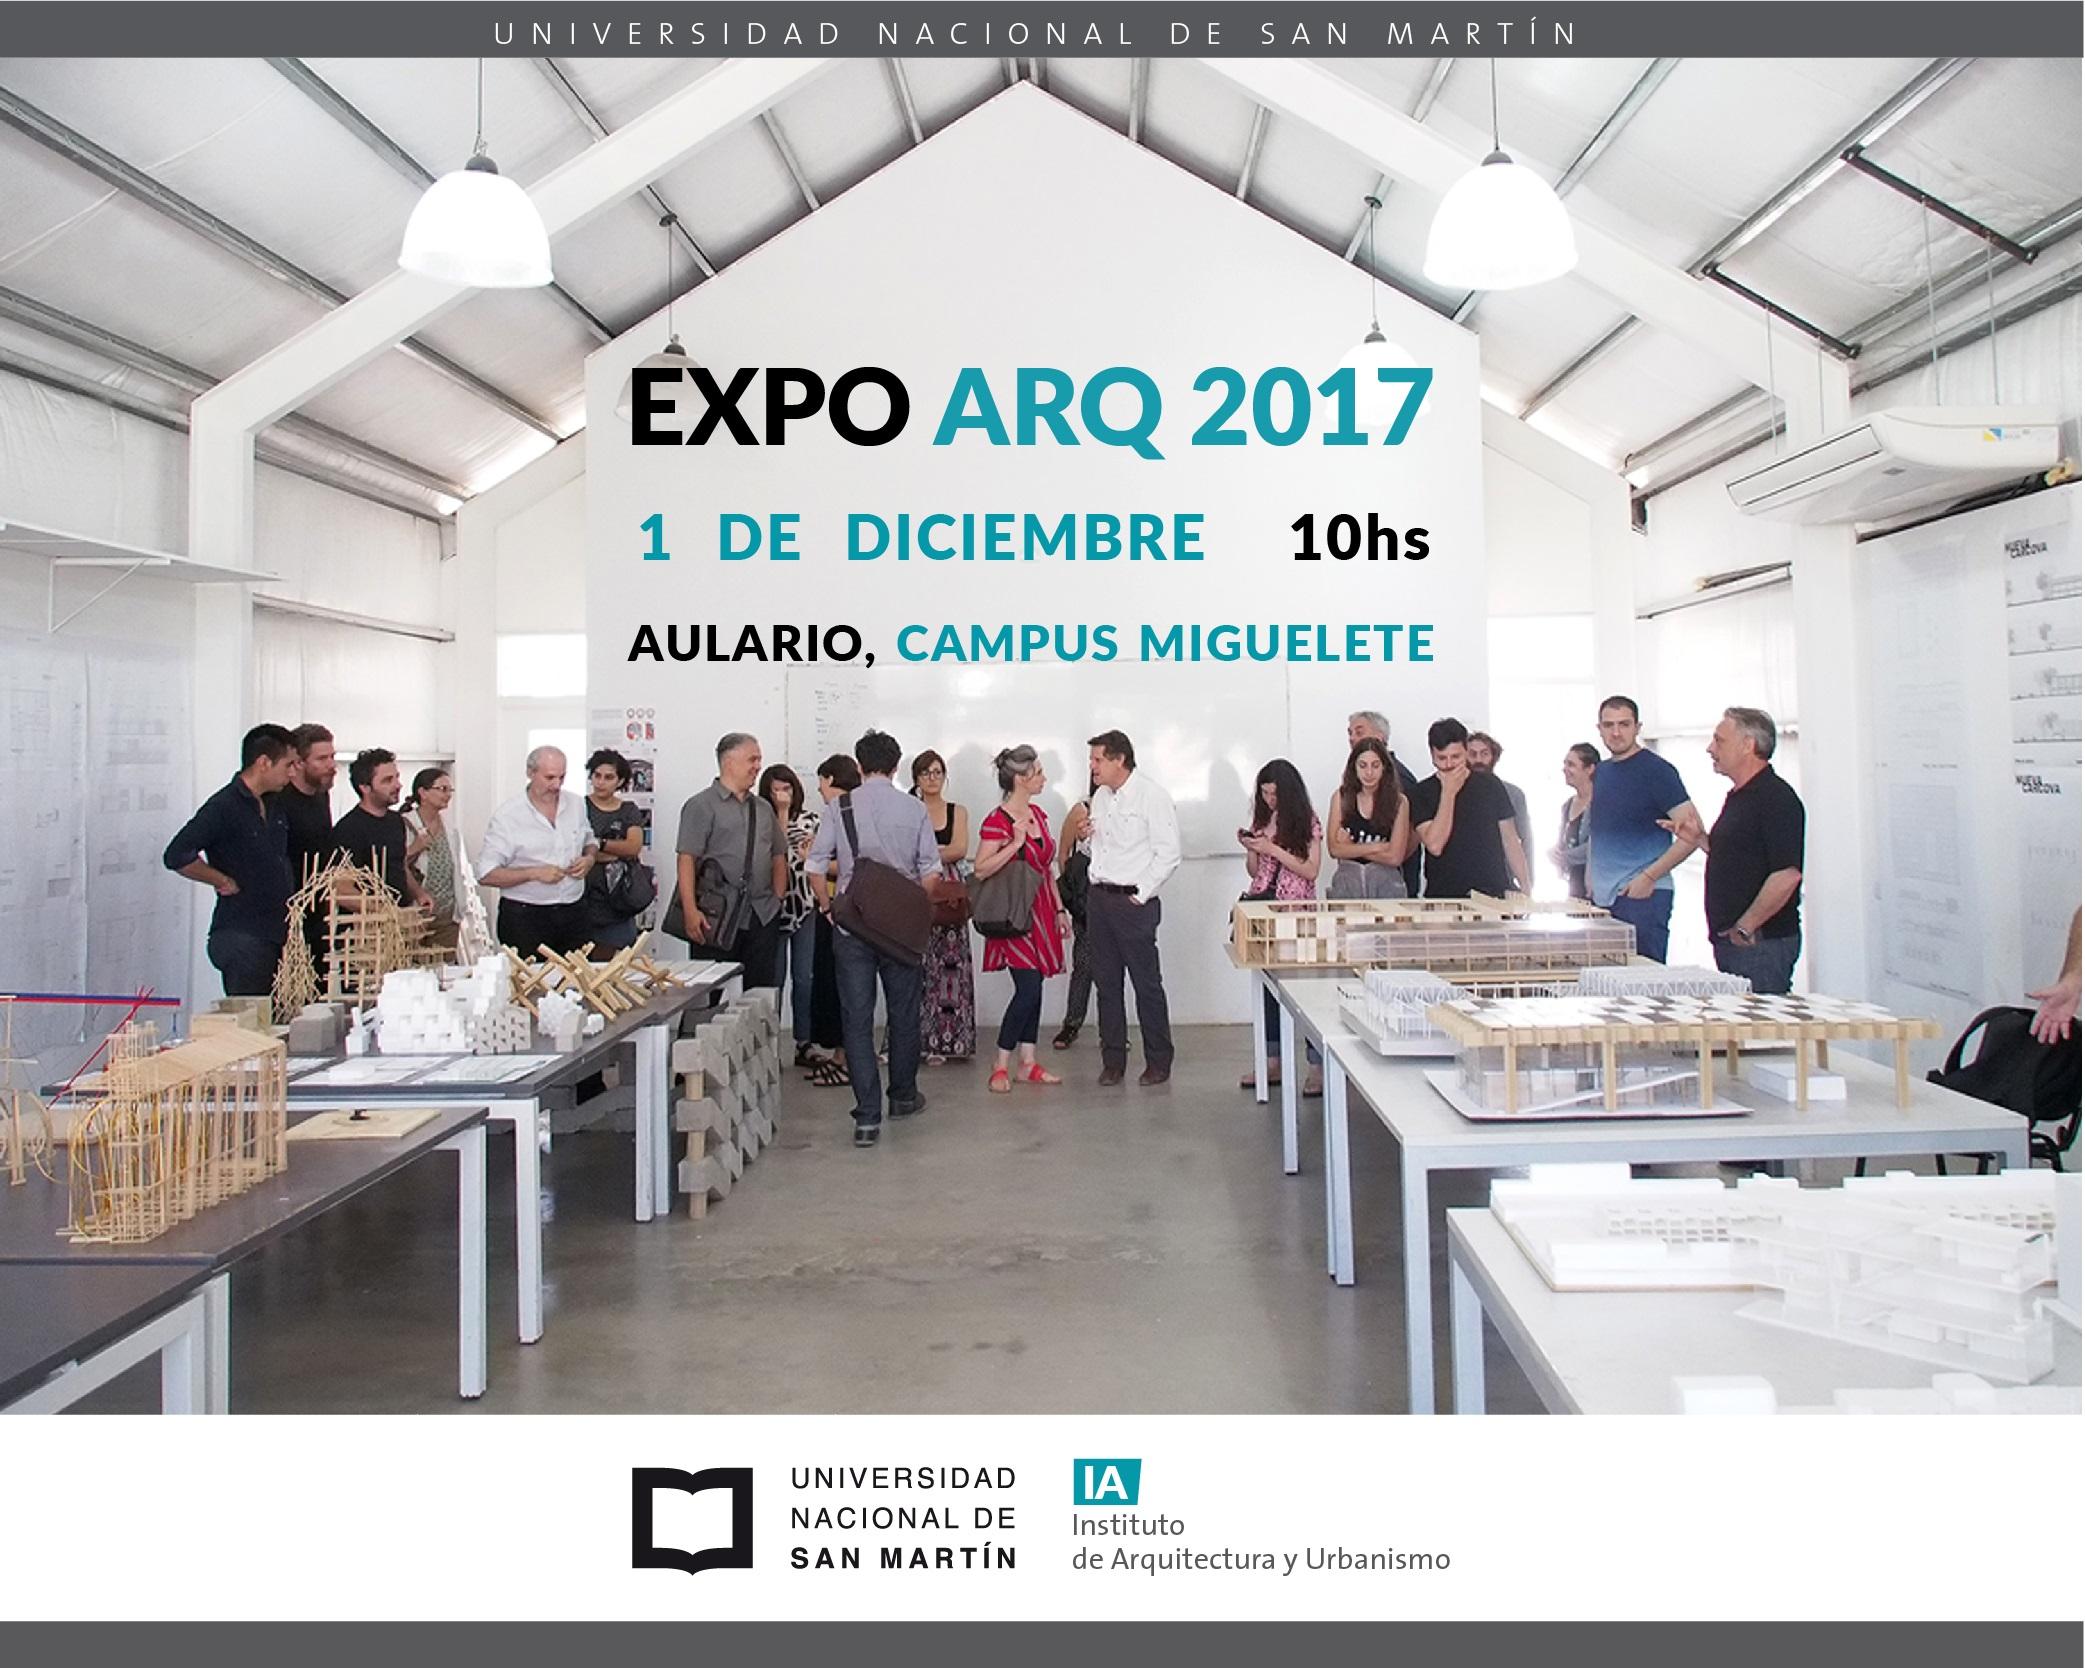 expo-2017-1